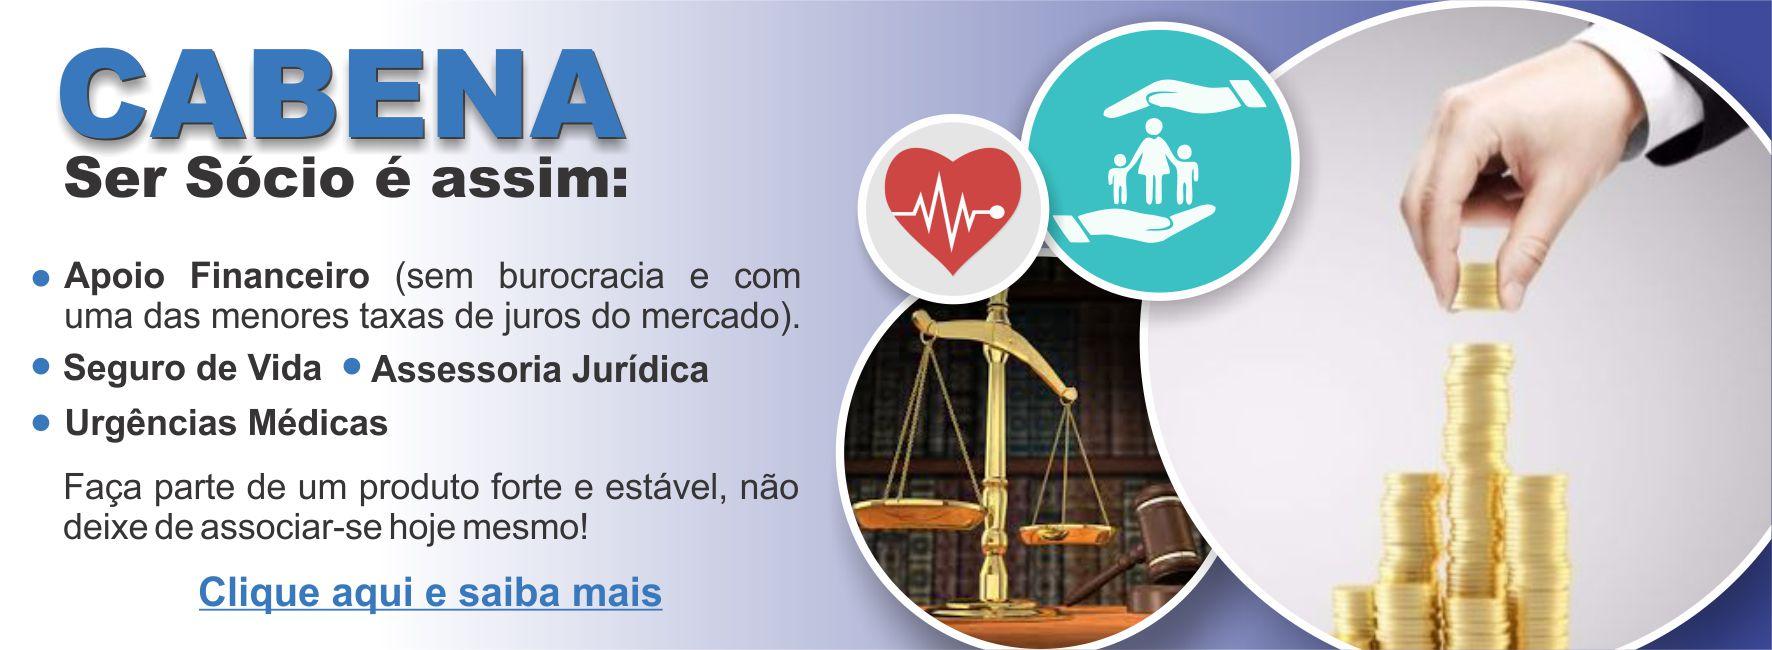 https://www.clubenaval.org.br/novo/?q=cabena